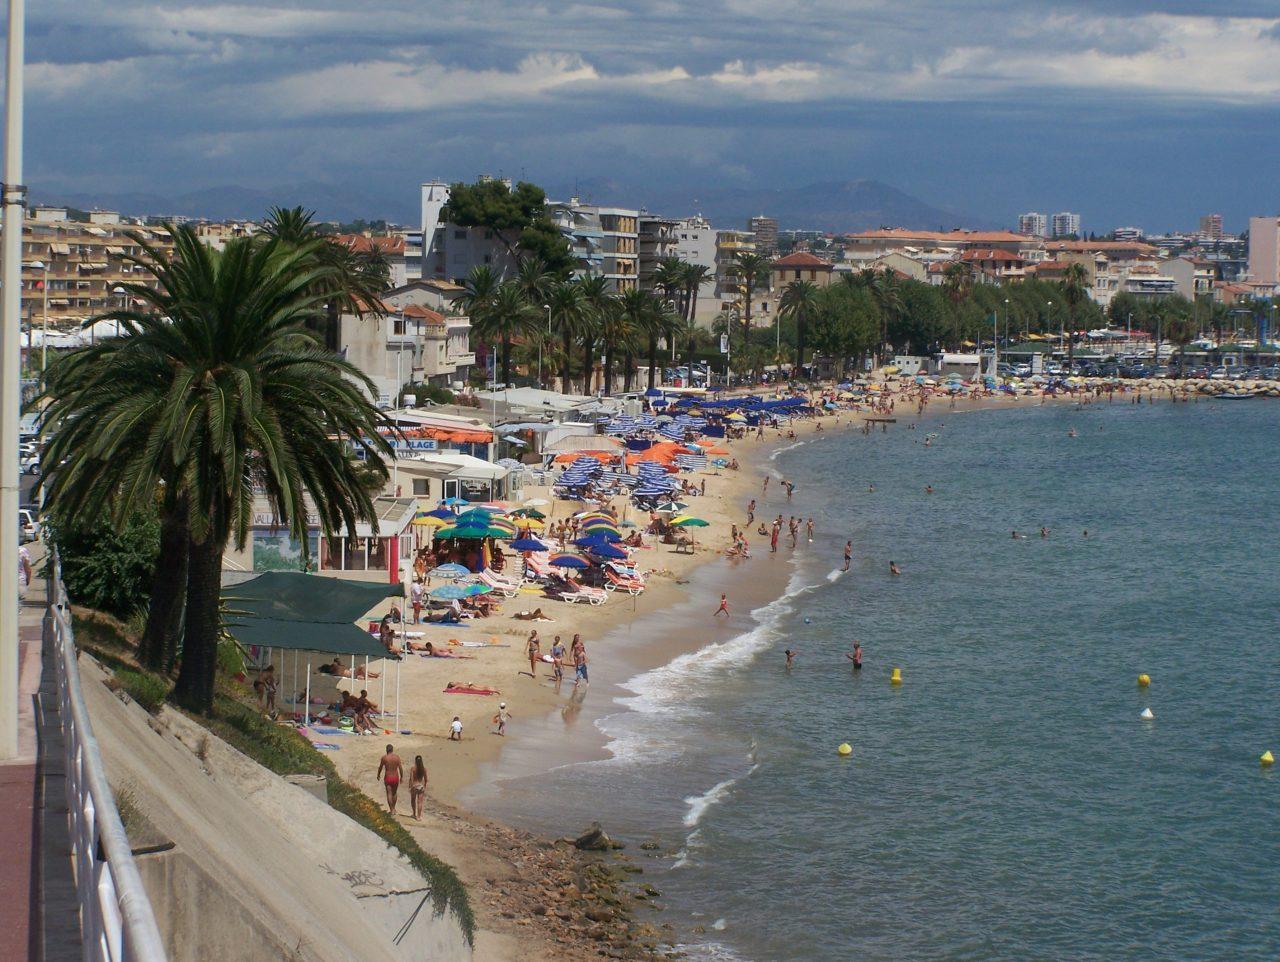 Baie_de_Golfe_Juan-1280x962.jpg